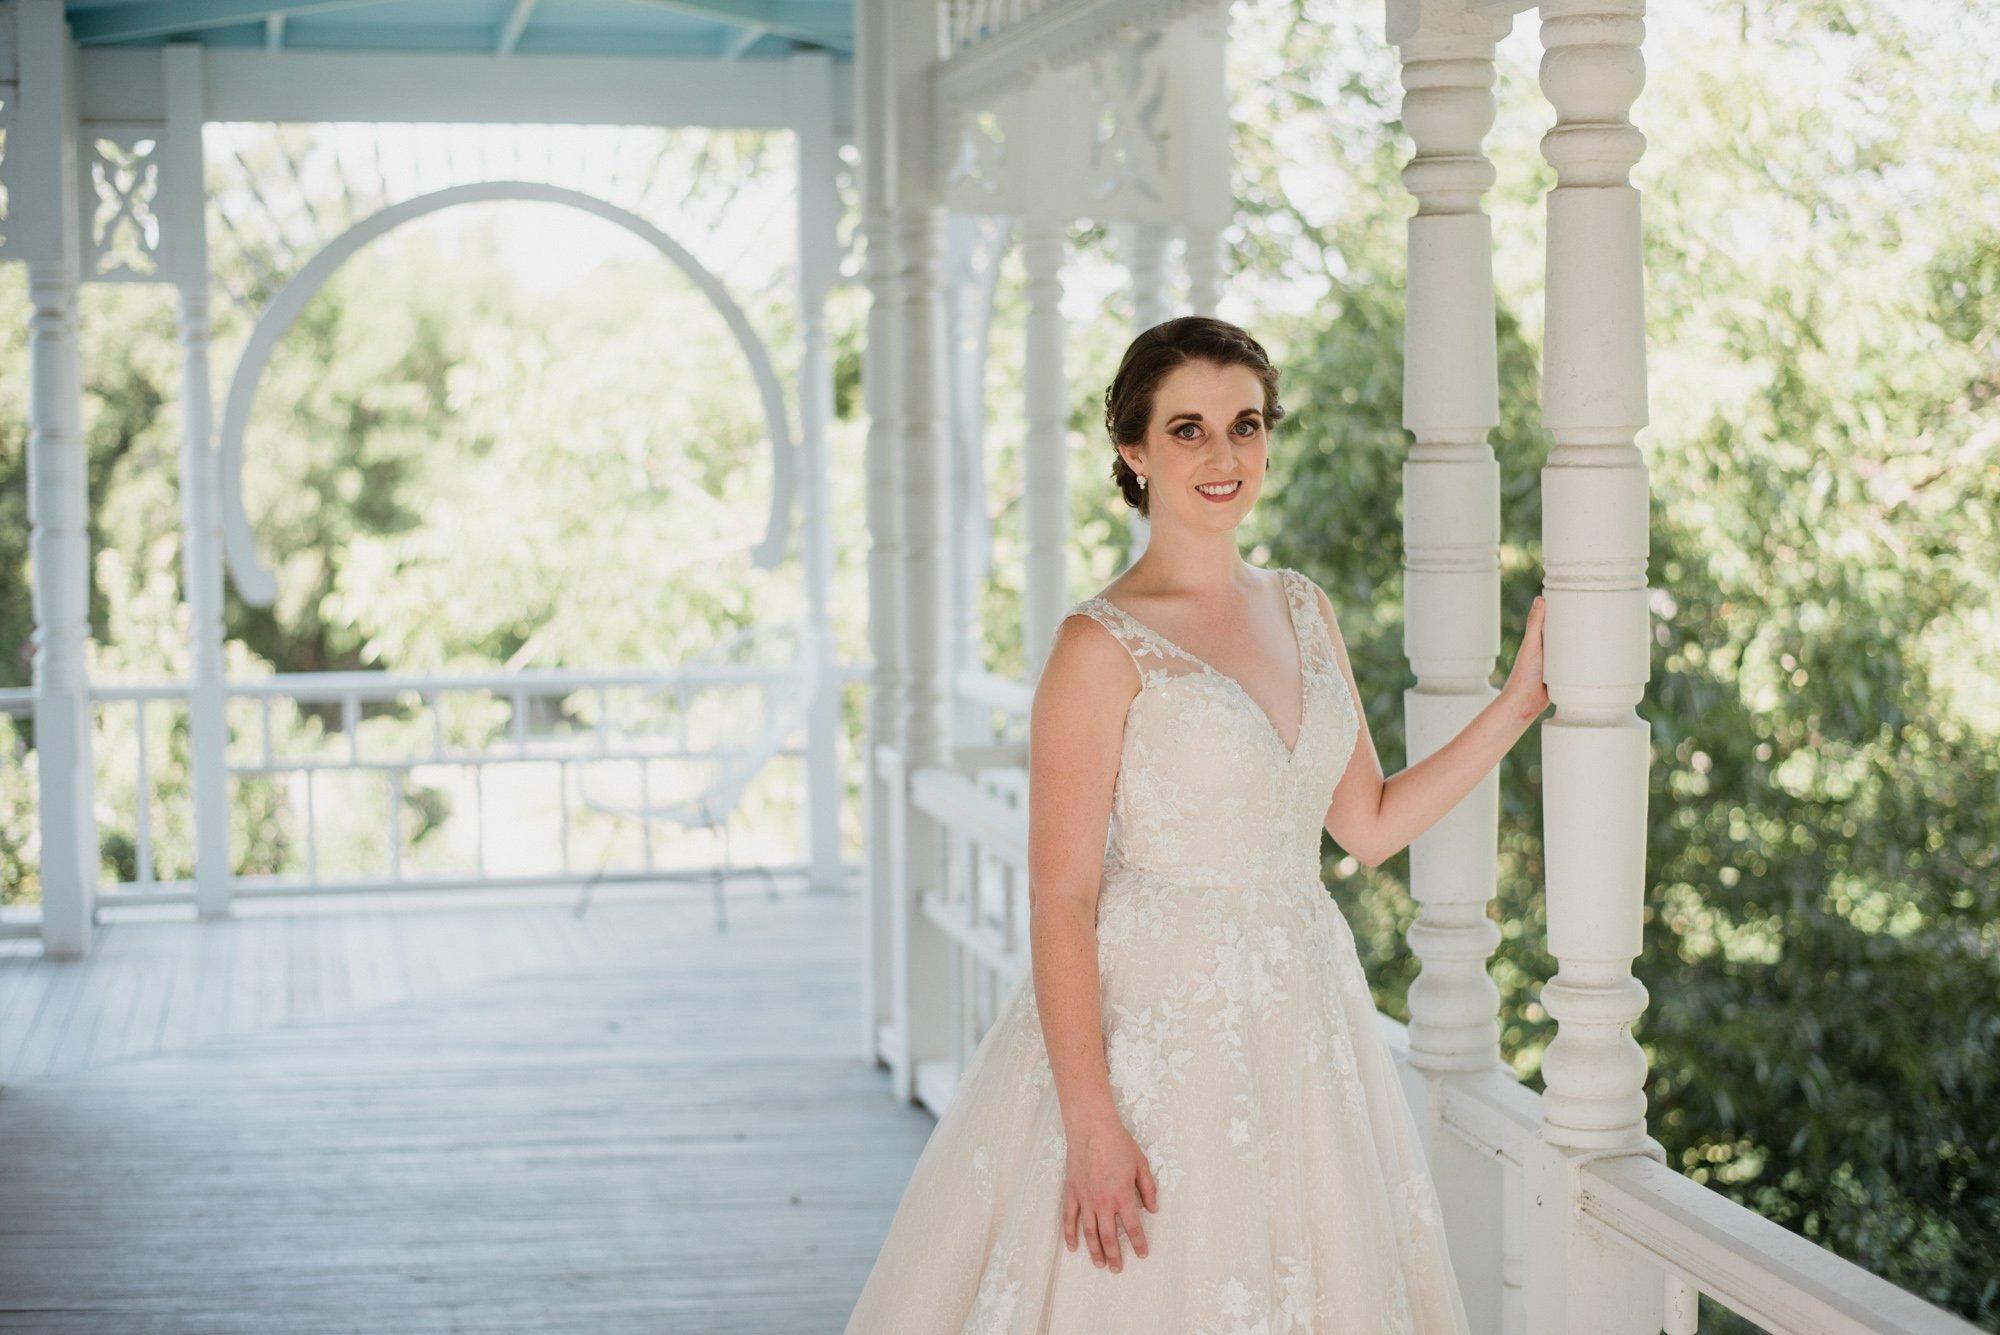 bridal session at barr mansion, bridal session, austin classic bridal portraits, austin barr mansion photographer